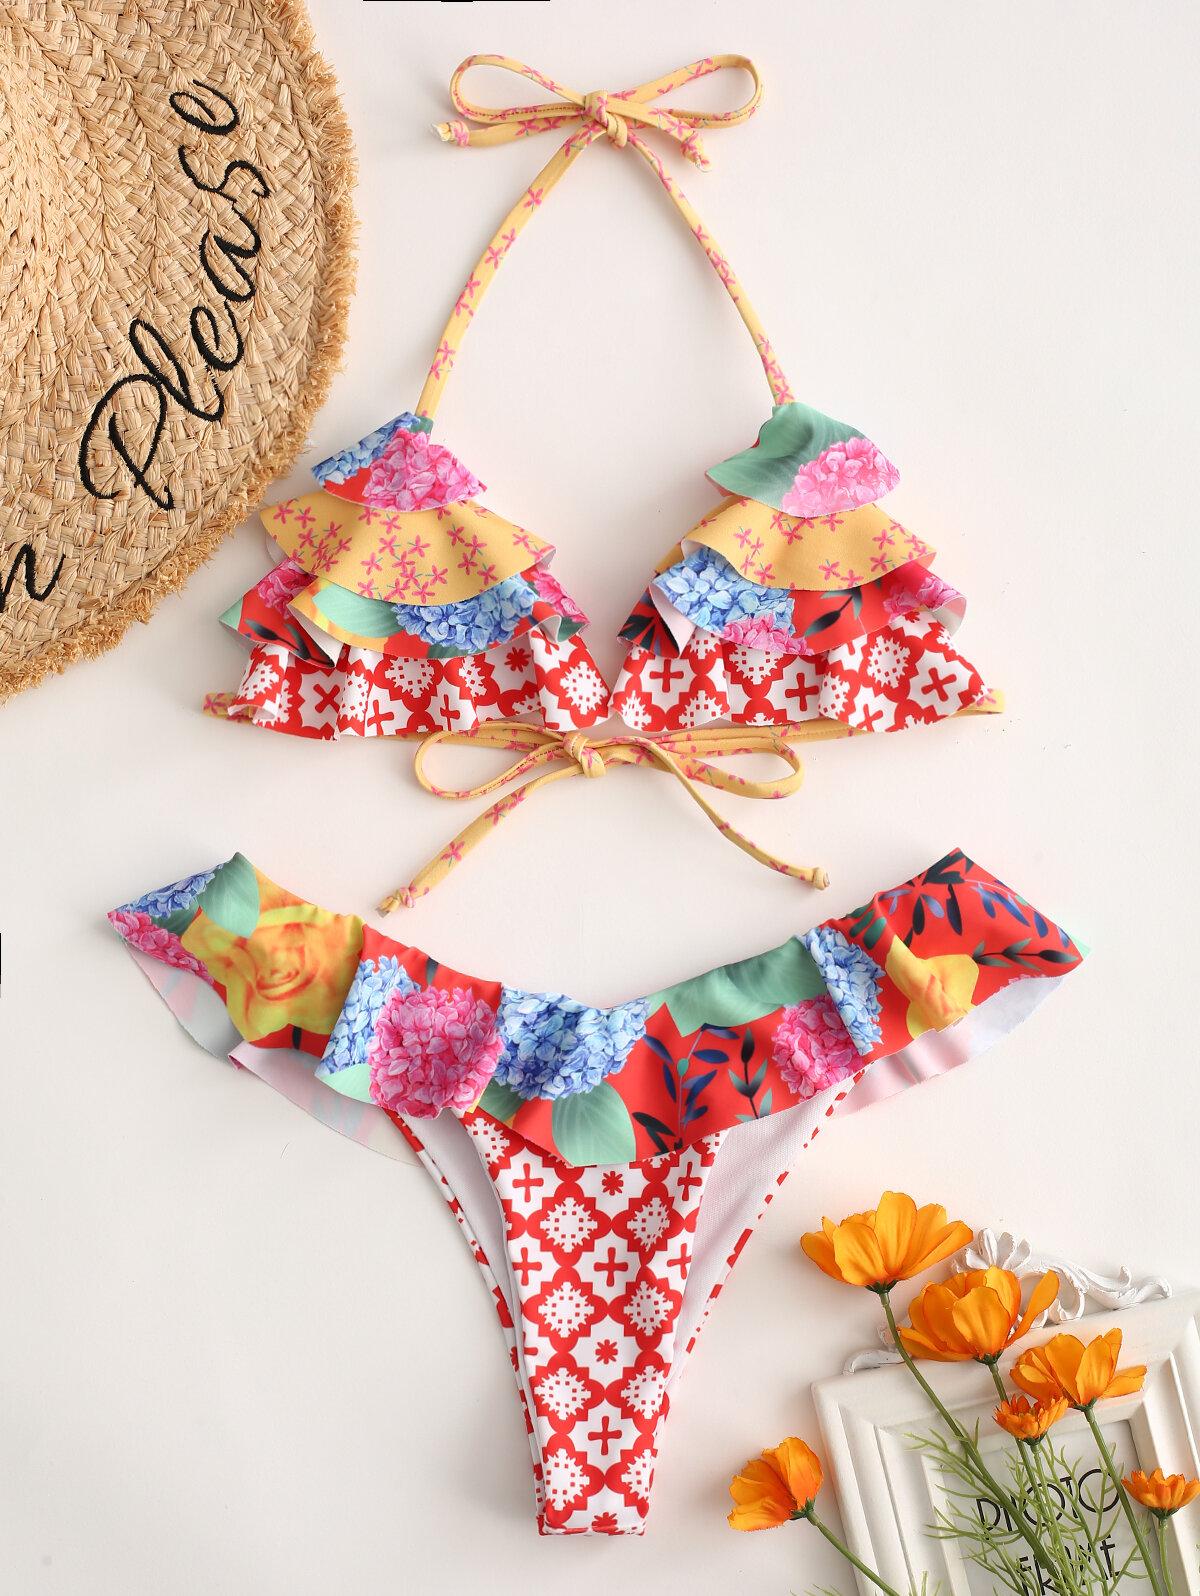 Halter Floral Sexy Bikinis Cake Triangle String Women Swimwear By Newchic